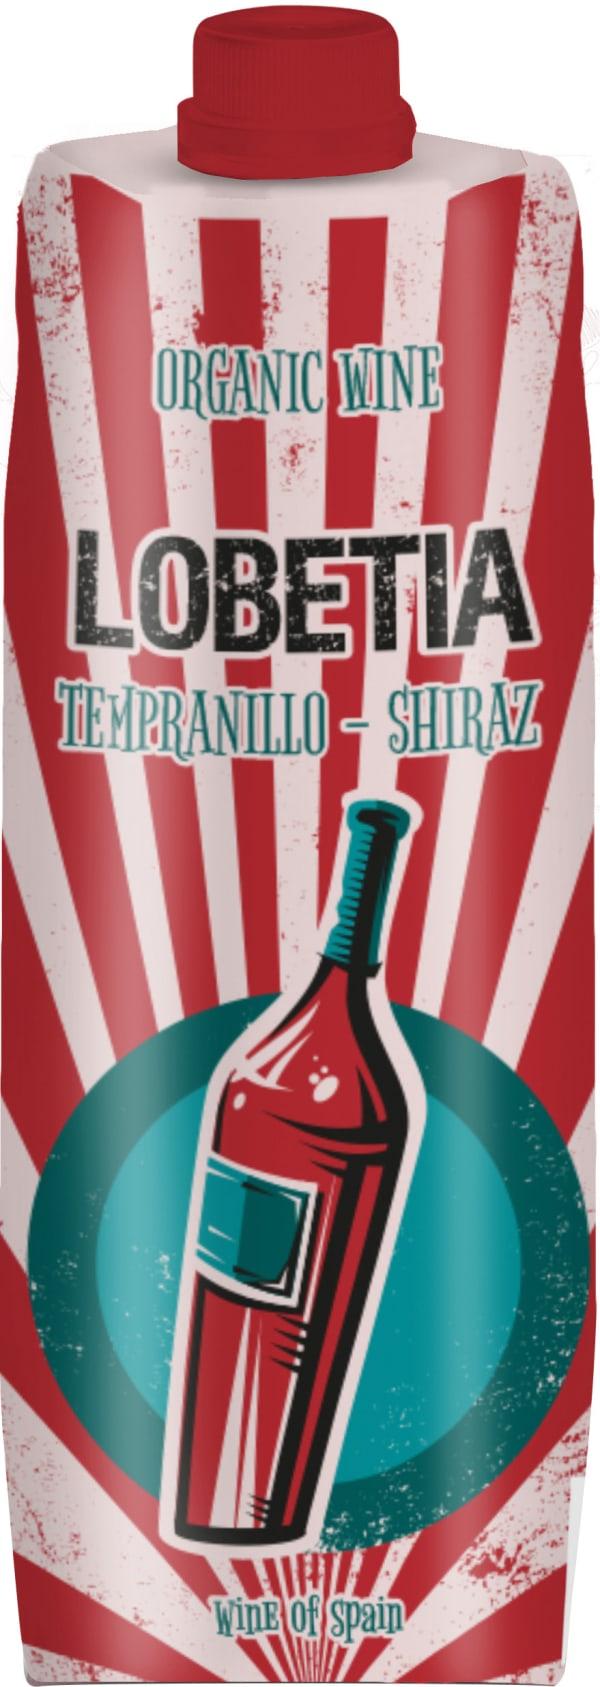 Lobetia Tempranillo Shiraz 2016 kartongförpackning